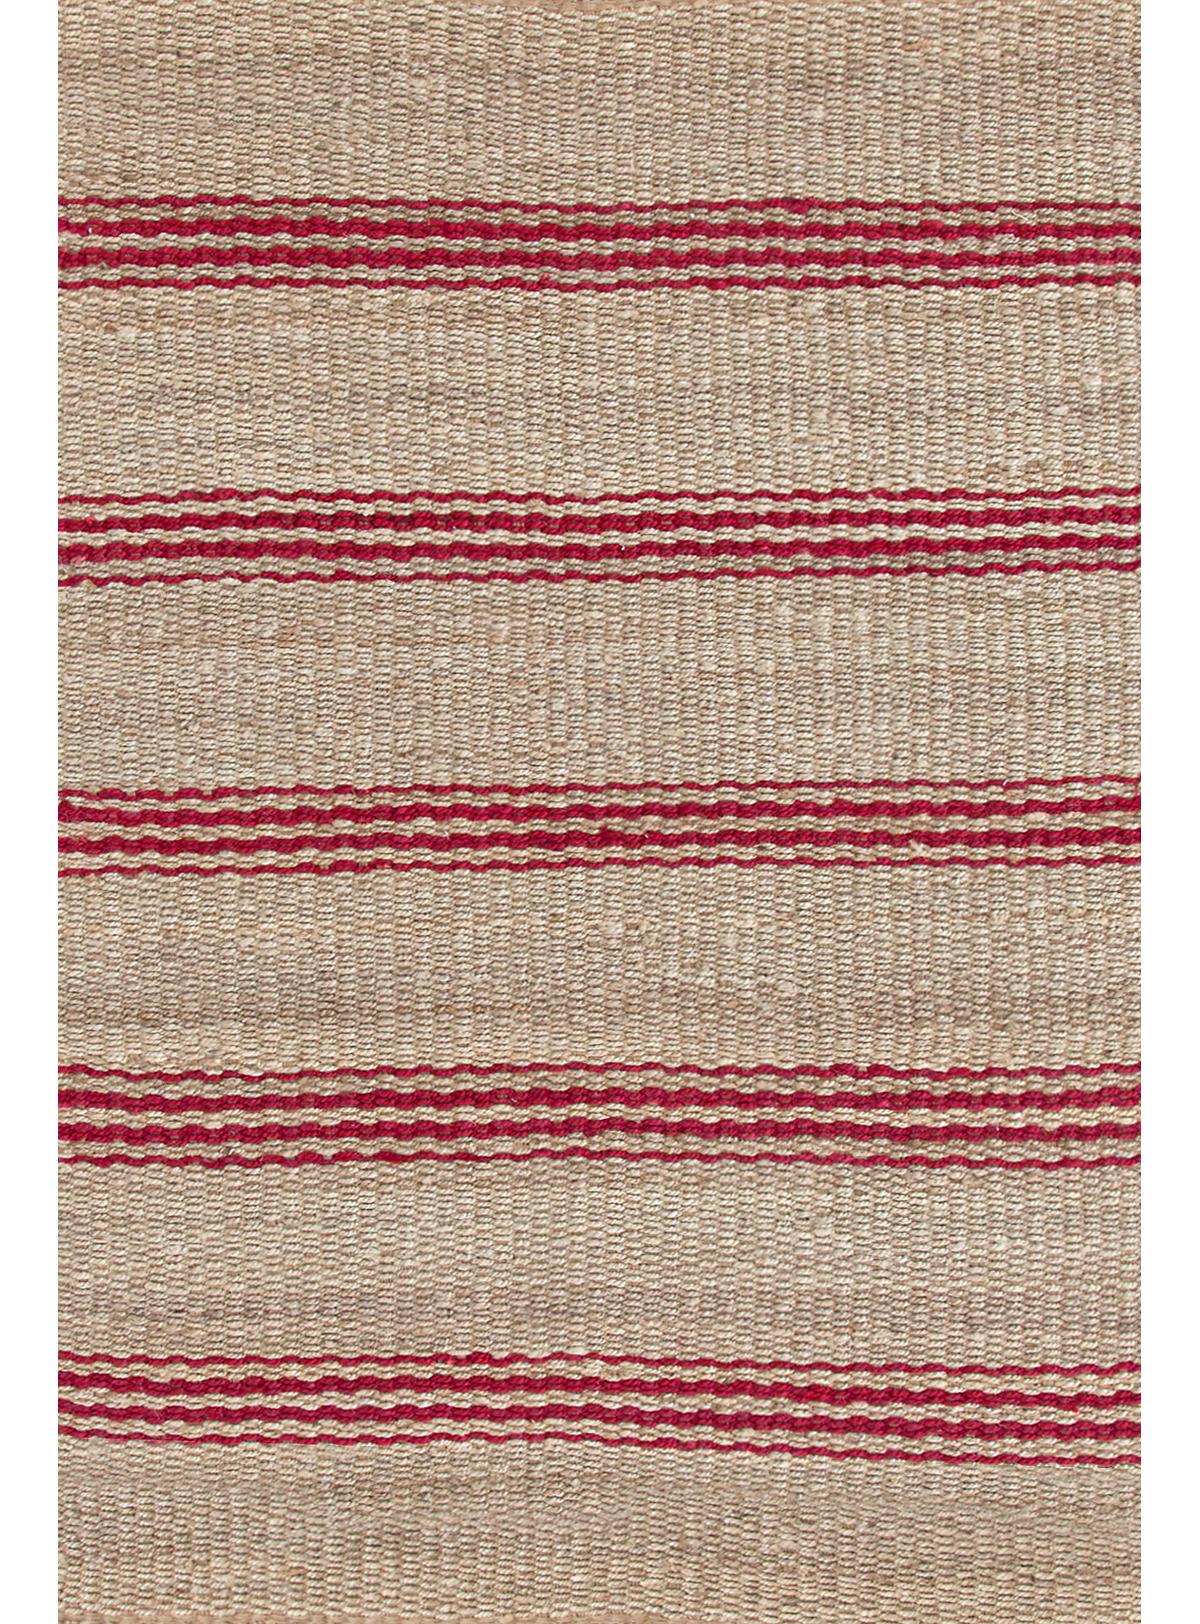 Jute Ticking Crimson Woven Rug